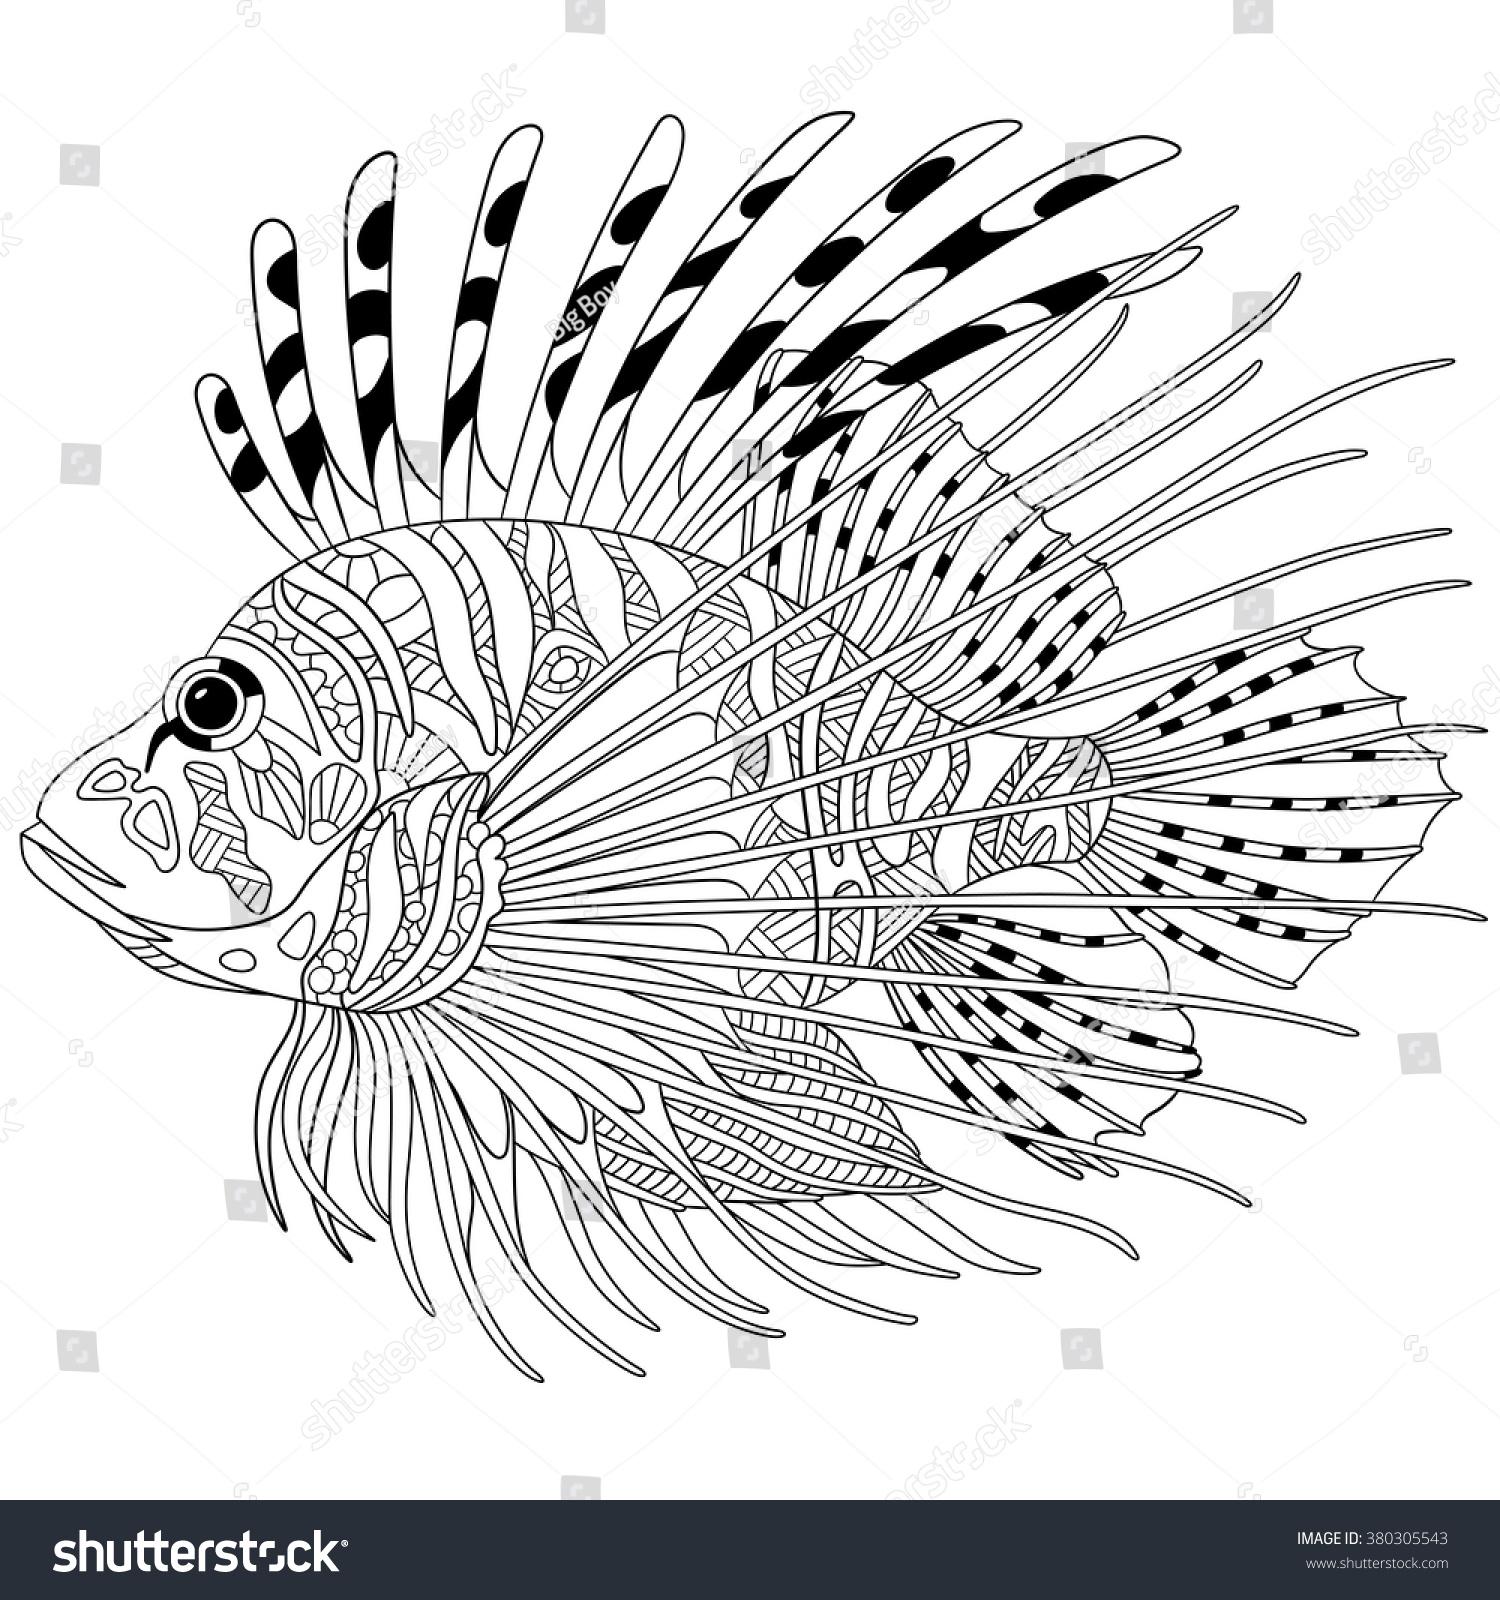 Zentangle Stylized Cartoon Zebrafish Lionfishpterois Volitans